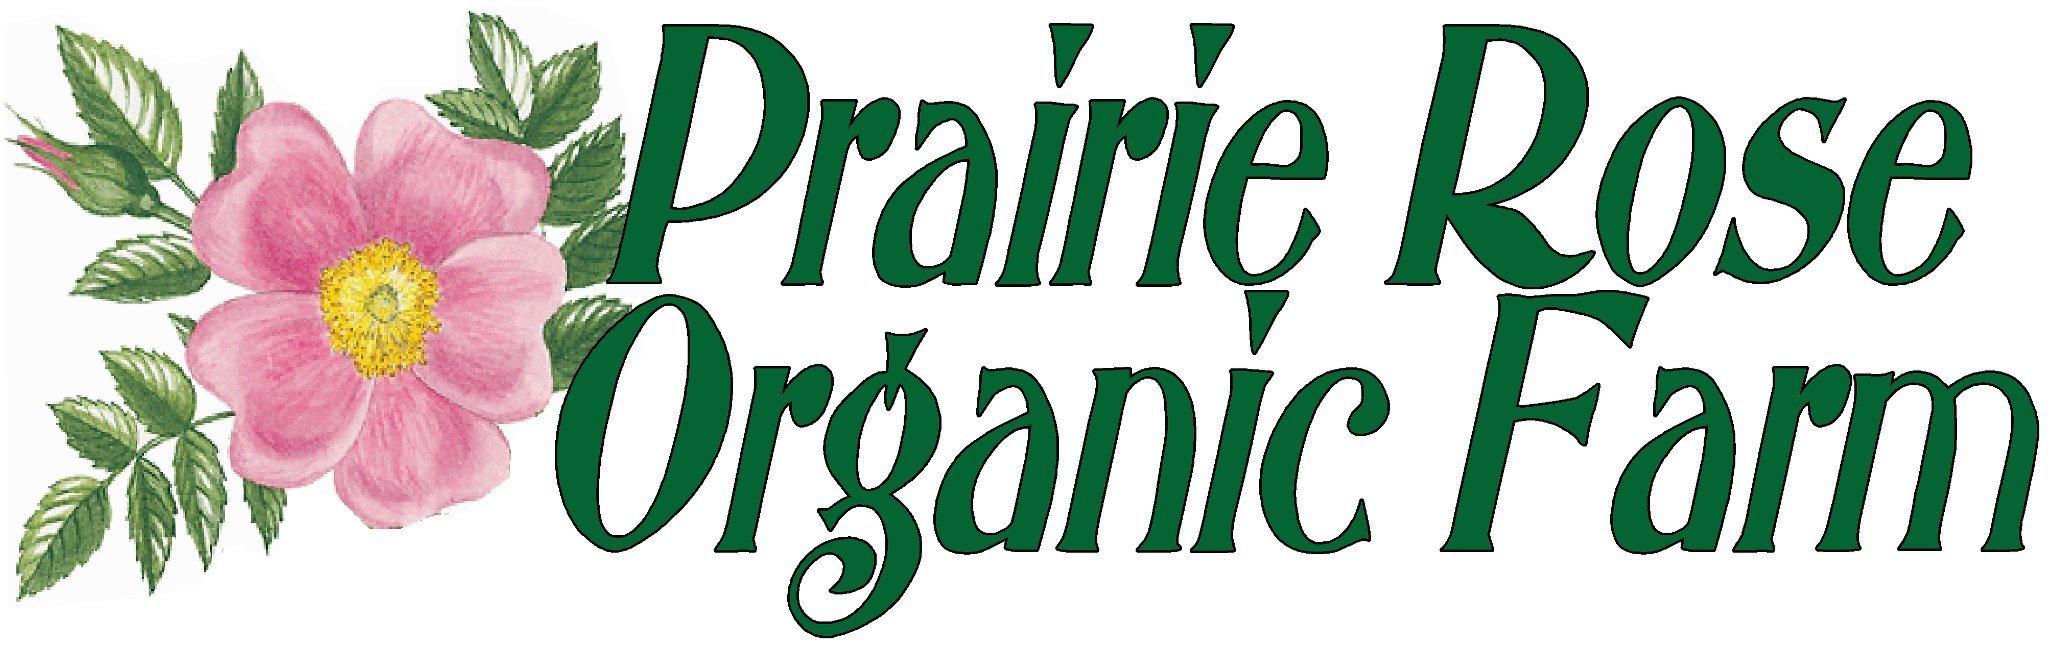 Prairie Rose Organic Spare Ribs pro18